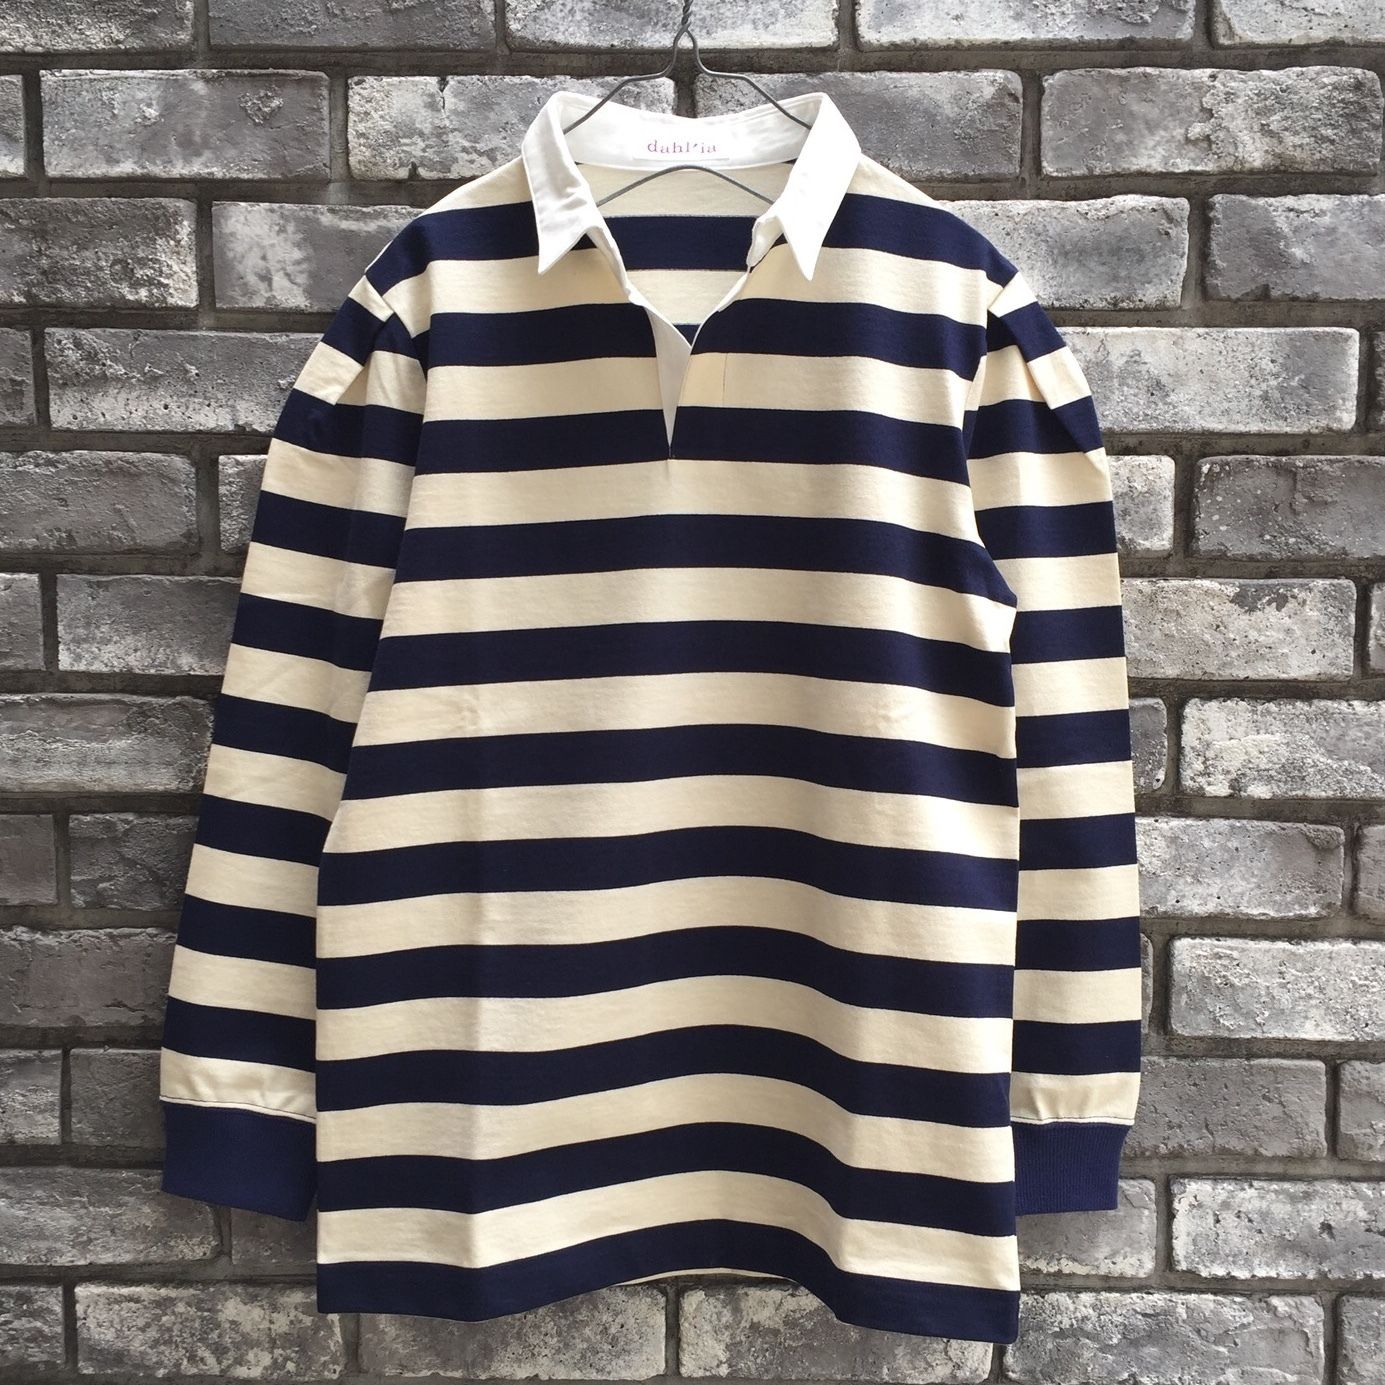 【dahl'ia】ラグビーシャツ